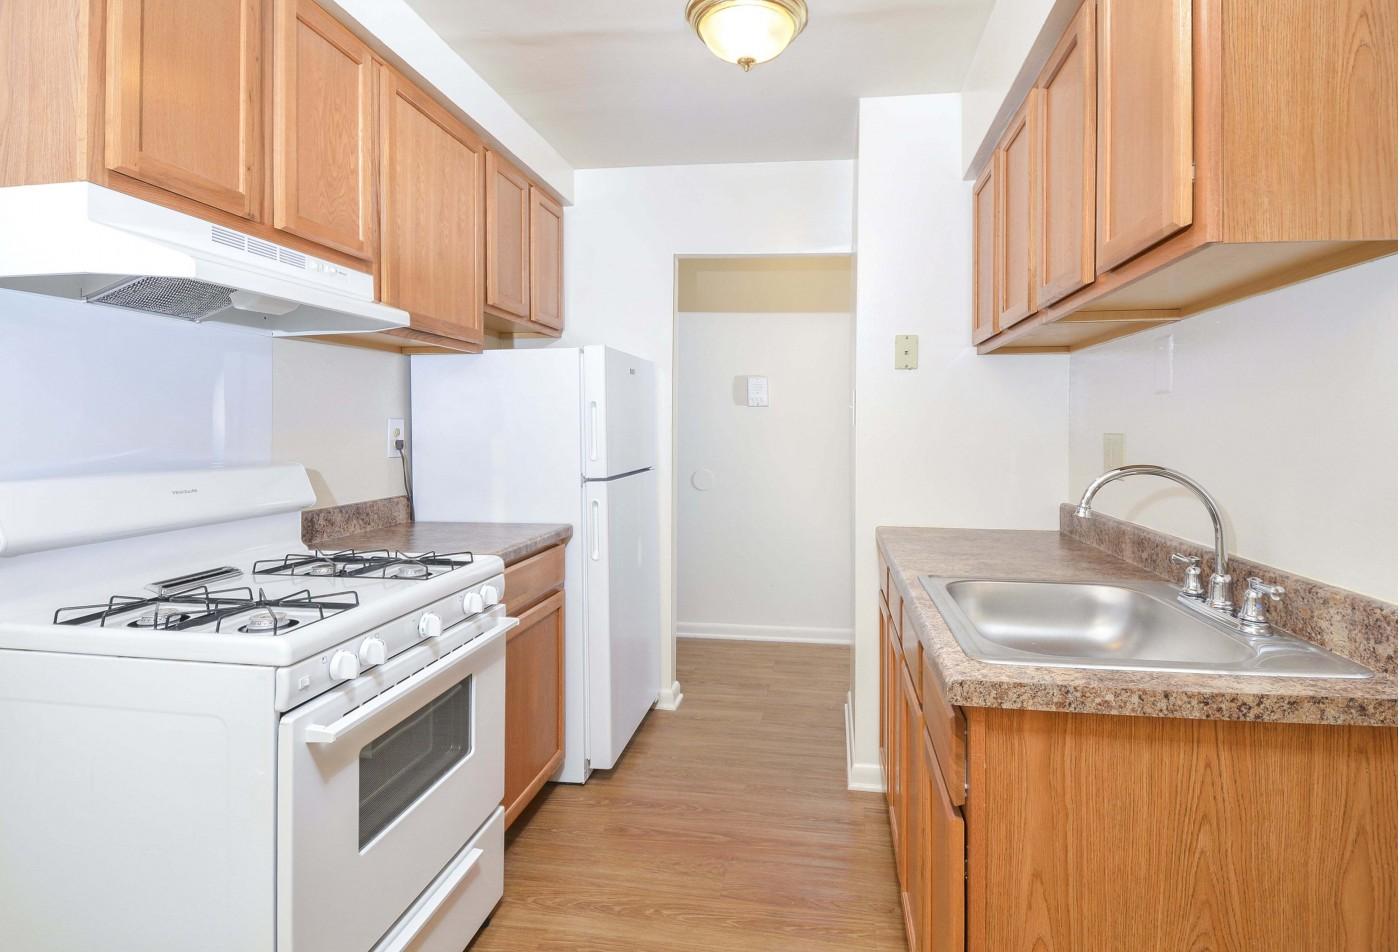 Modern Kitchen | Levittown PA Apartment For Rent | Newport Village Apartments